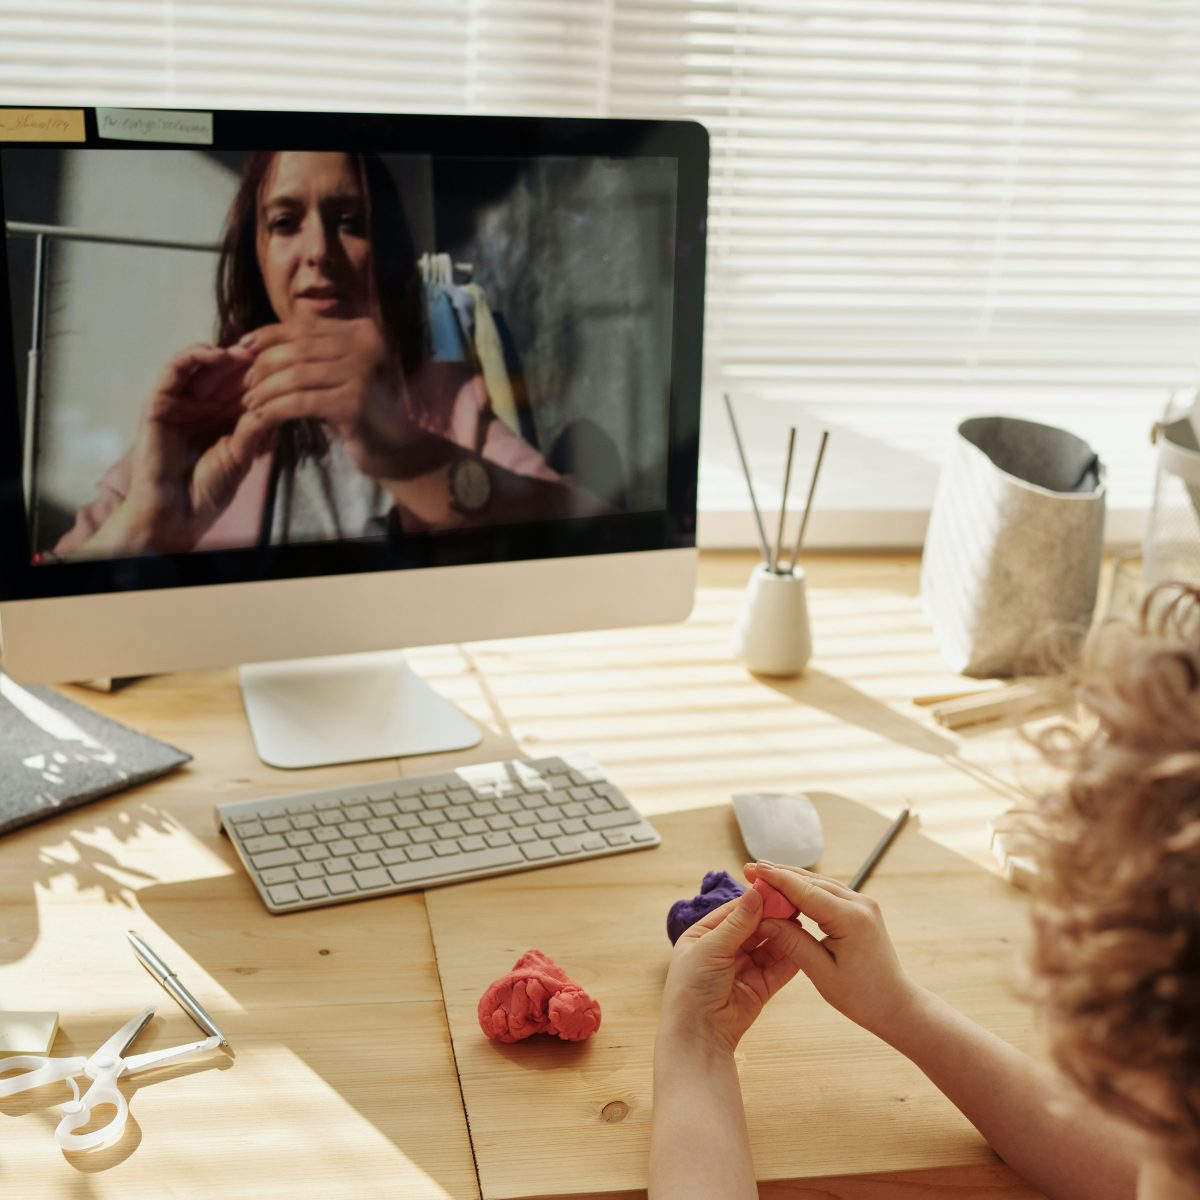 Oltre l'emergenza: una didattica digitale sempre integrata